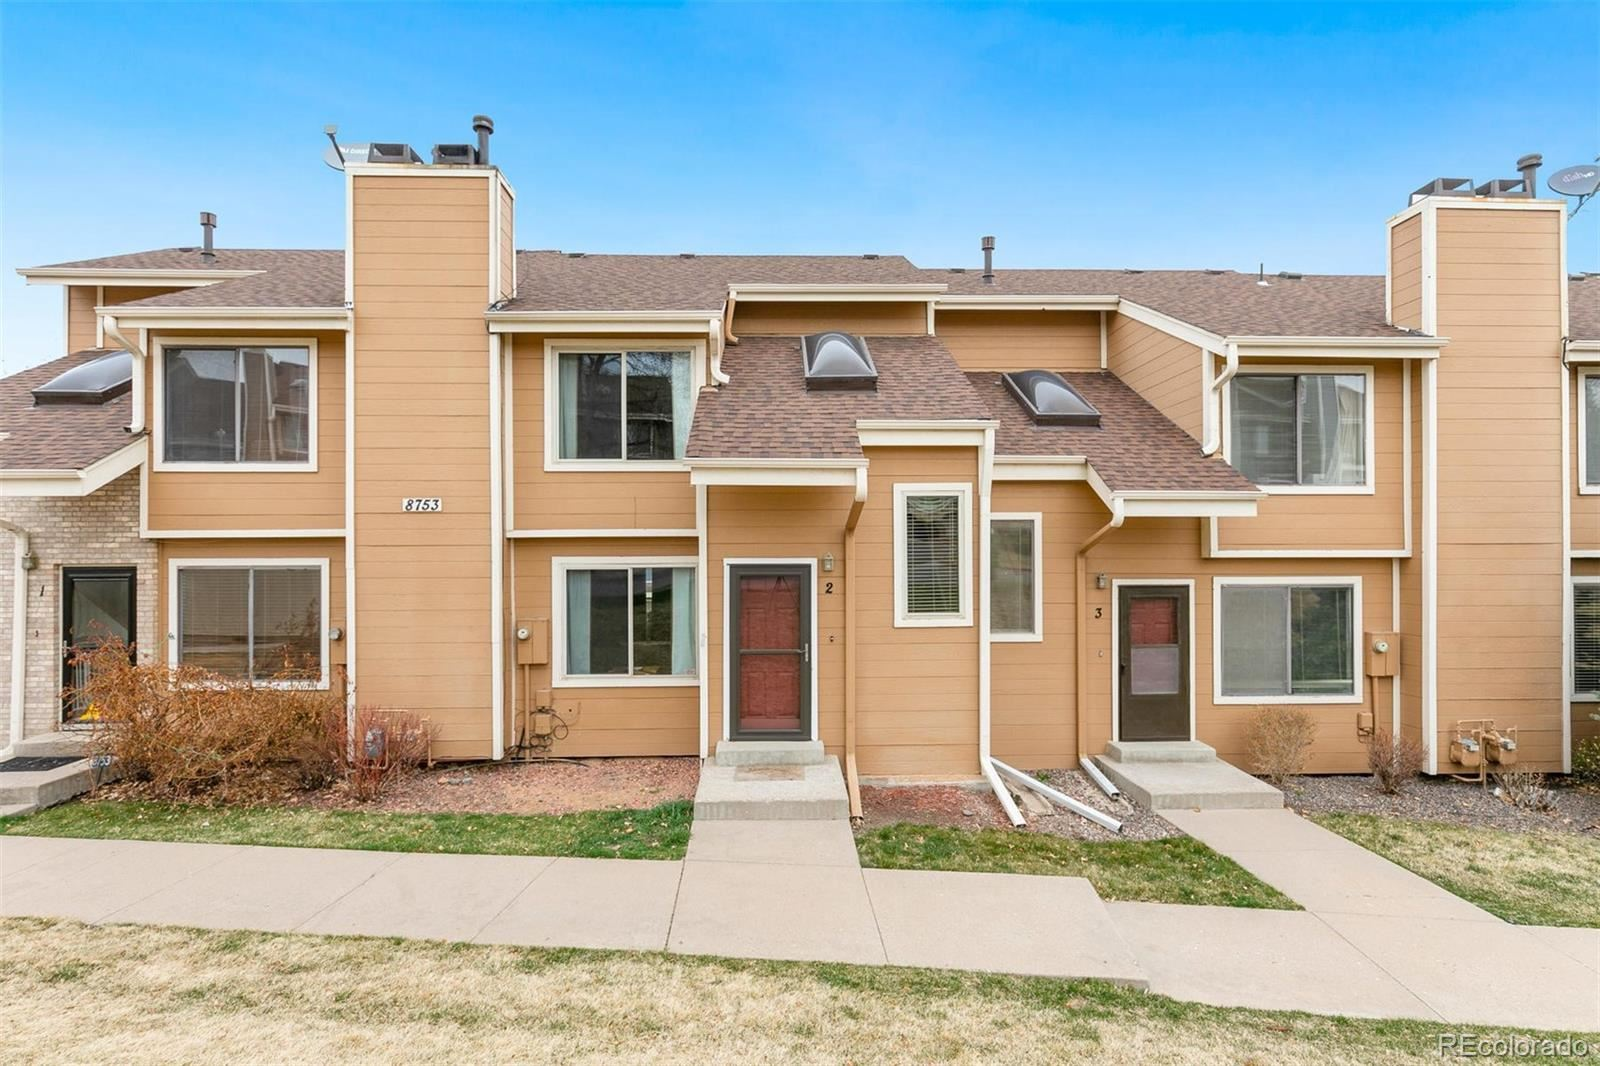 8753 W Cornell Avenue #12-2, Lakewood, CO 80227 - #: 6787567